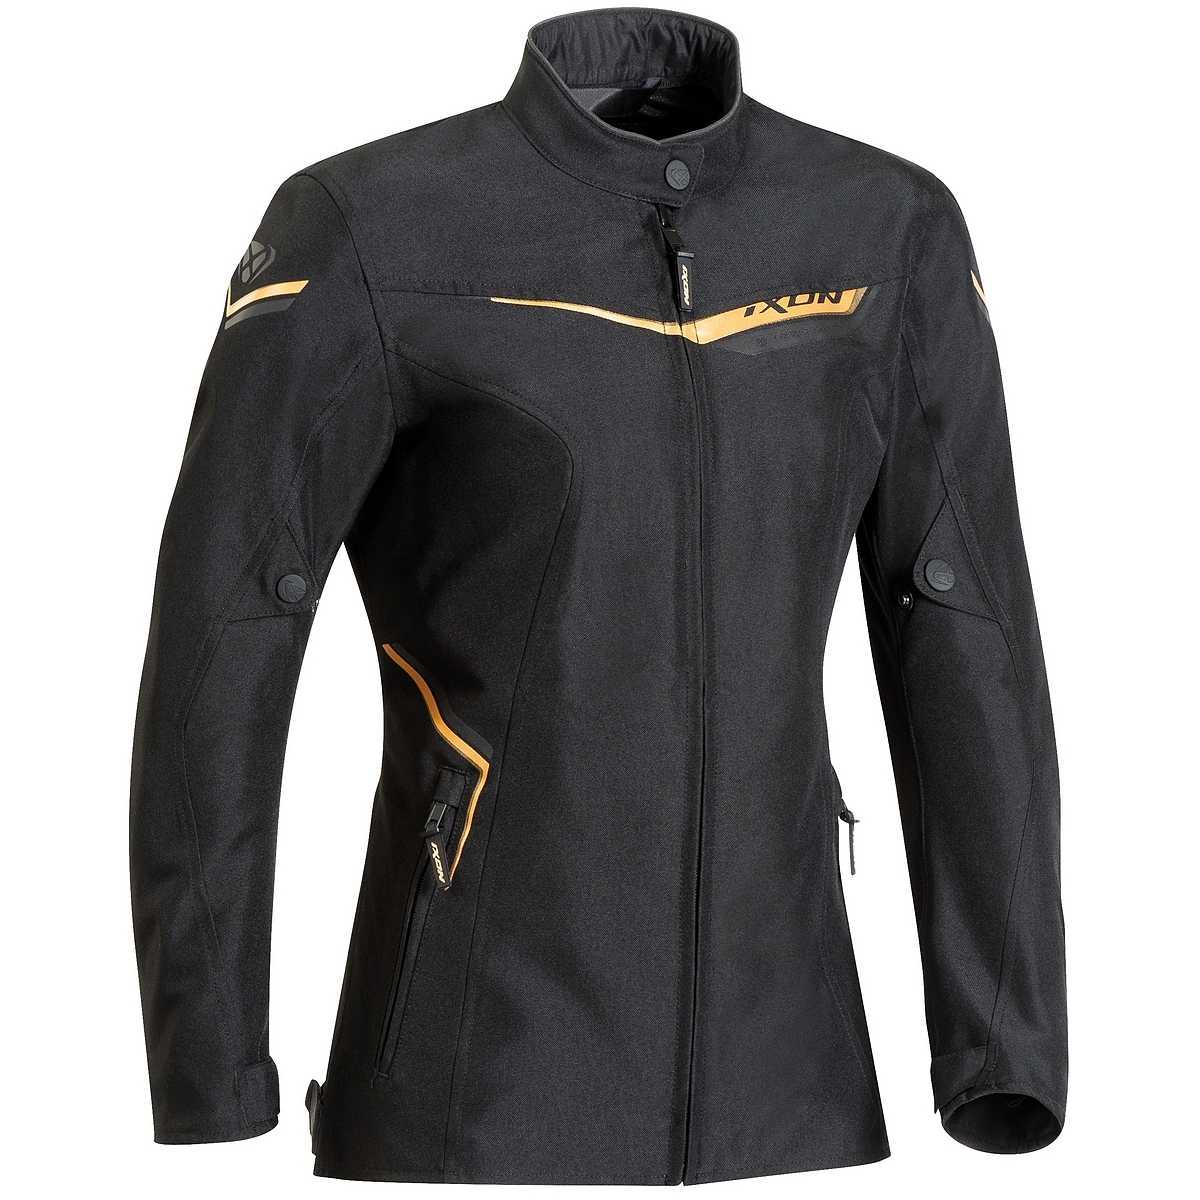 Ixon Women's Slash Black/Gold Jacket